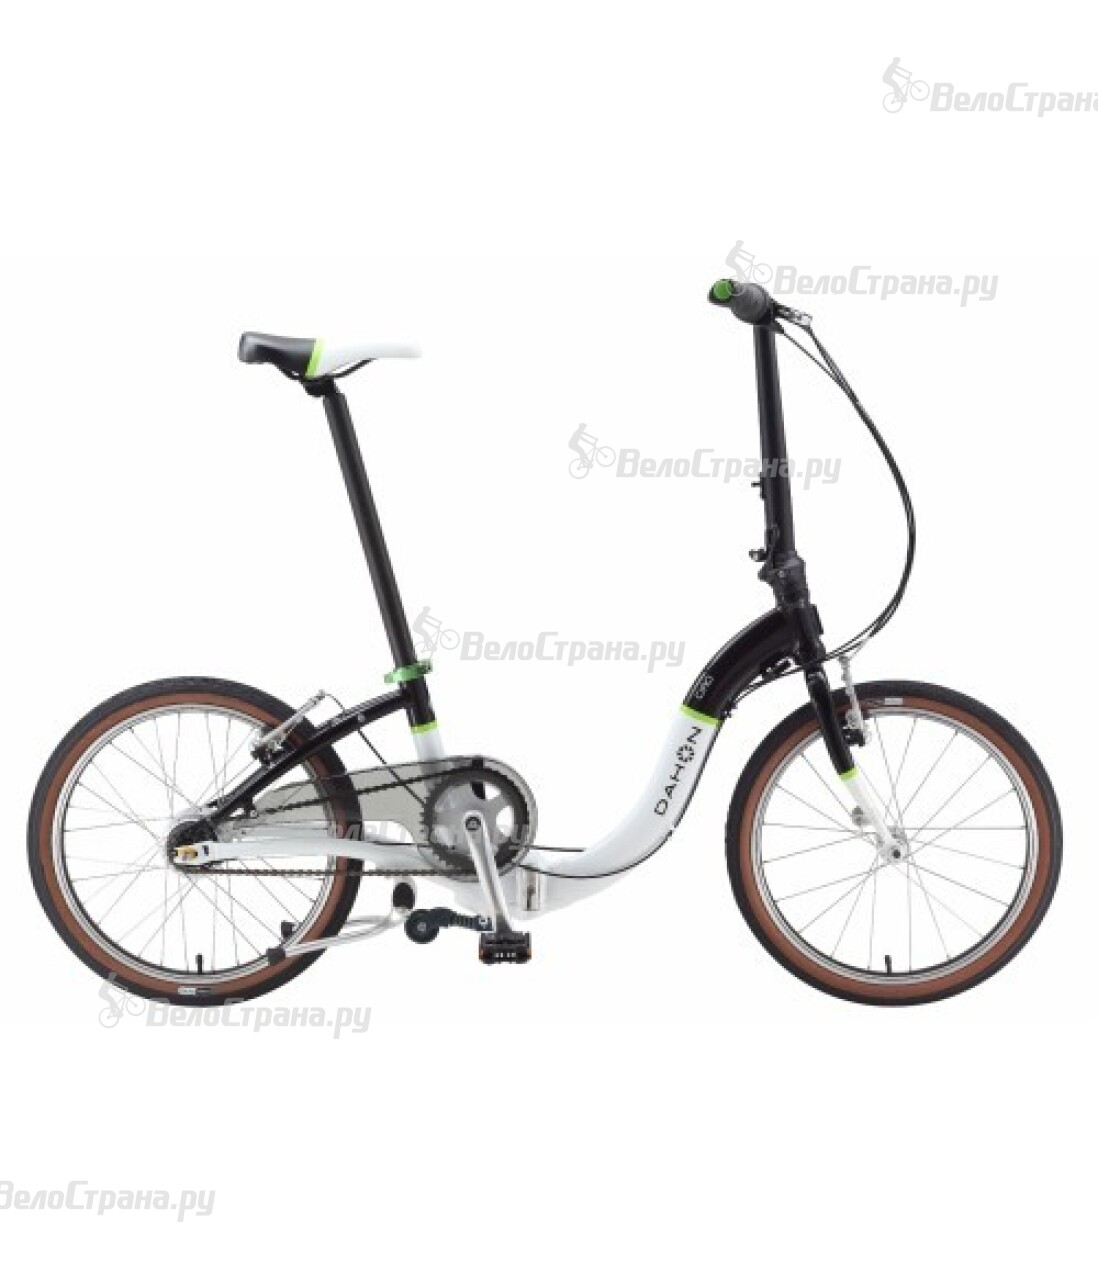 Велосипед Dahon Ciao D7 (2015) гарнитура yison d7 pink